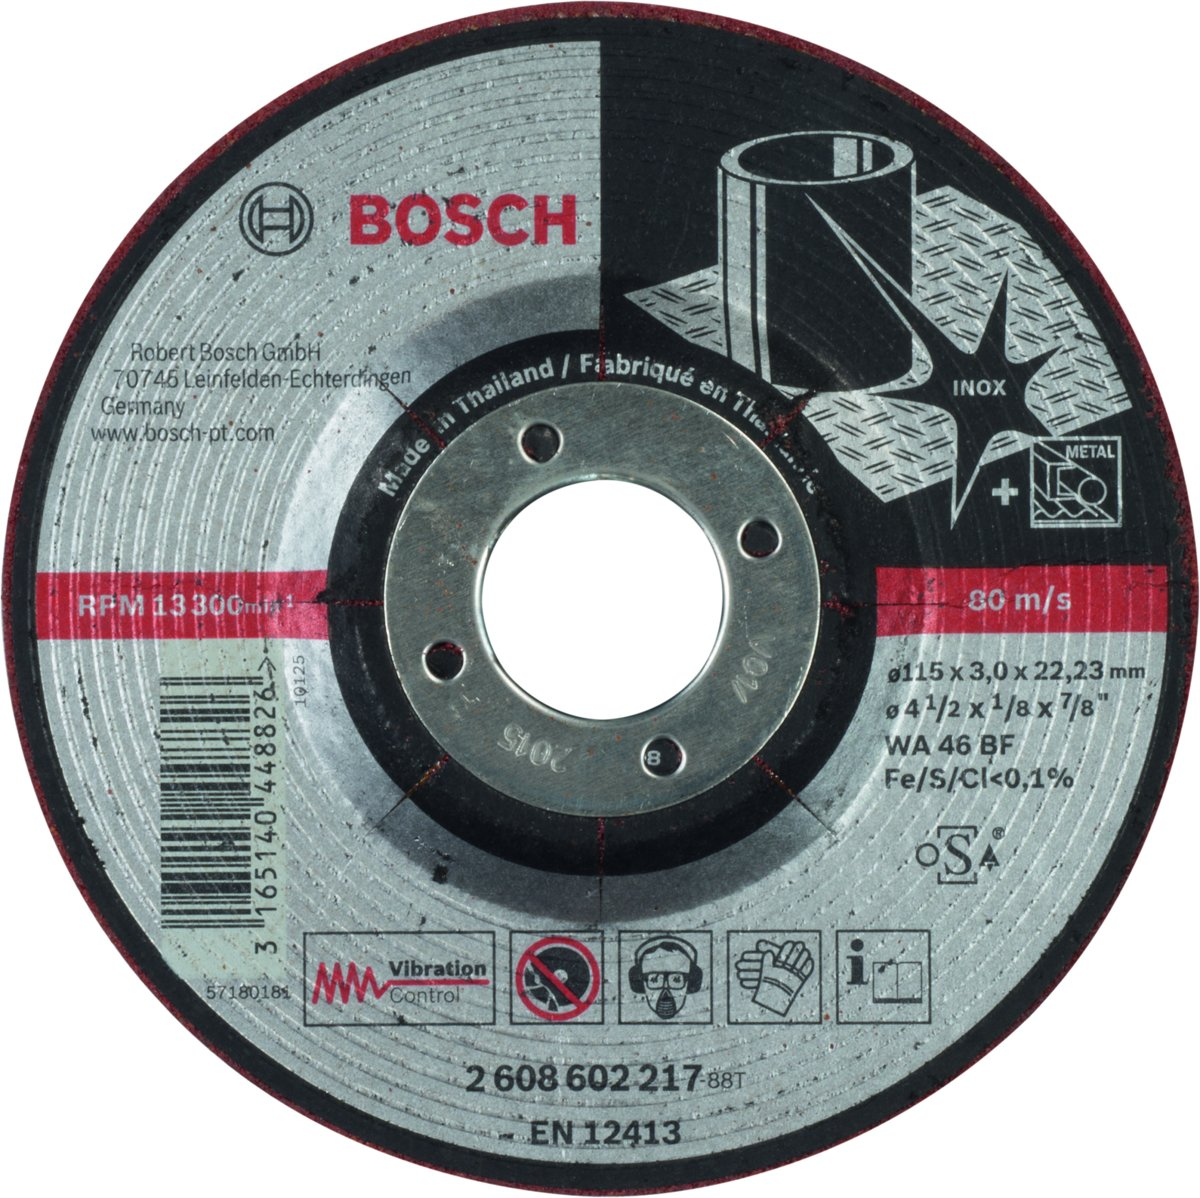 Bosch - Semiflexibele afbraamschijf WA 46 BF, 115 mm, 22,23 mm, 3,0 mm kopen